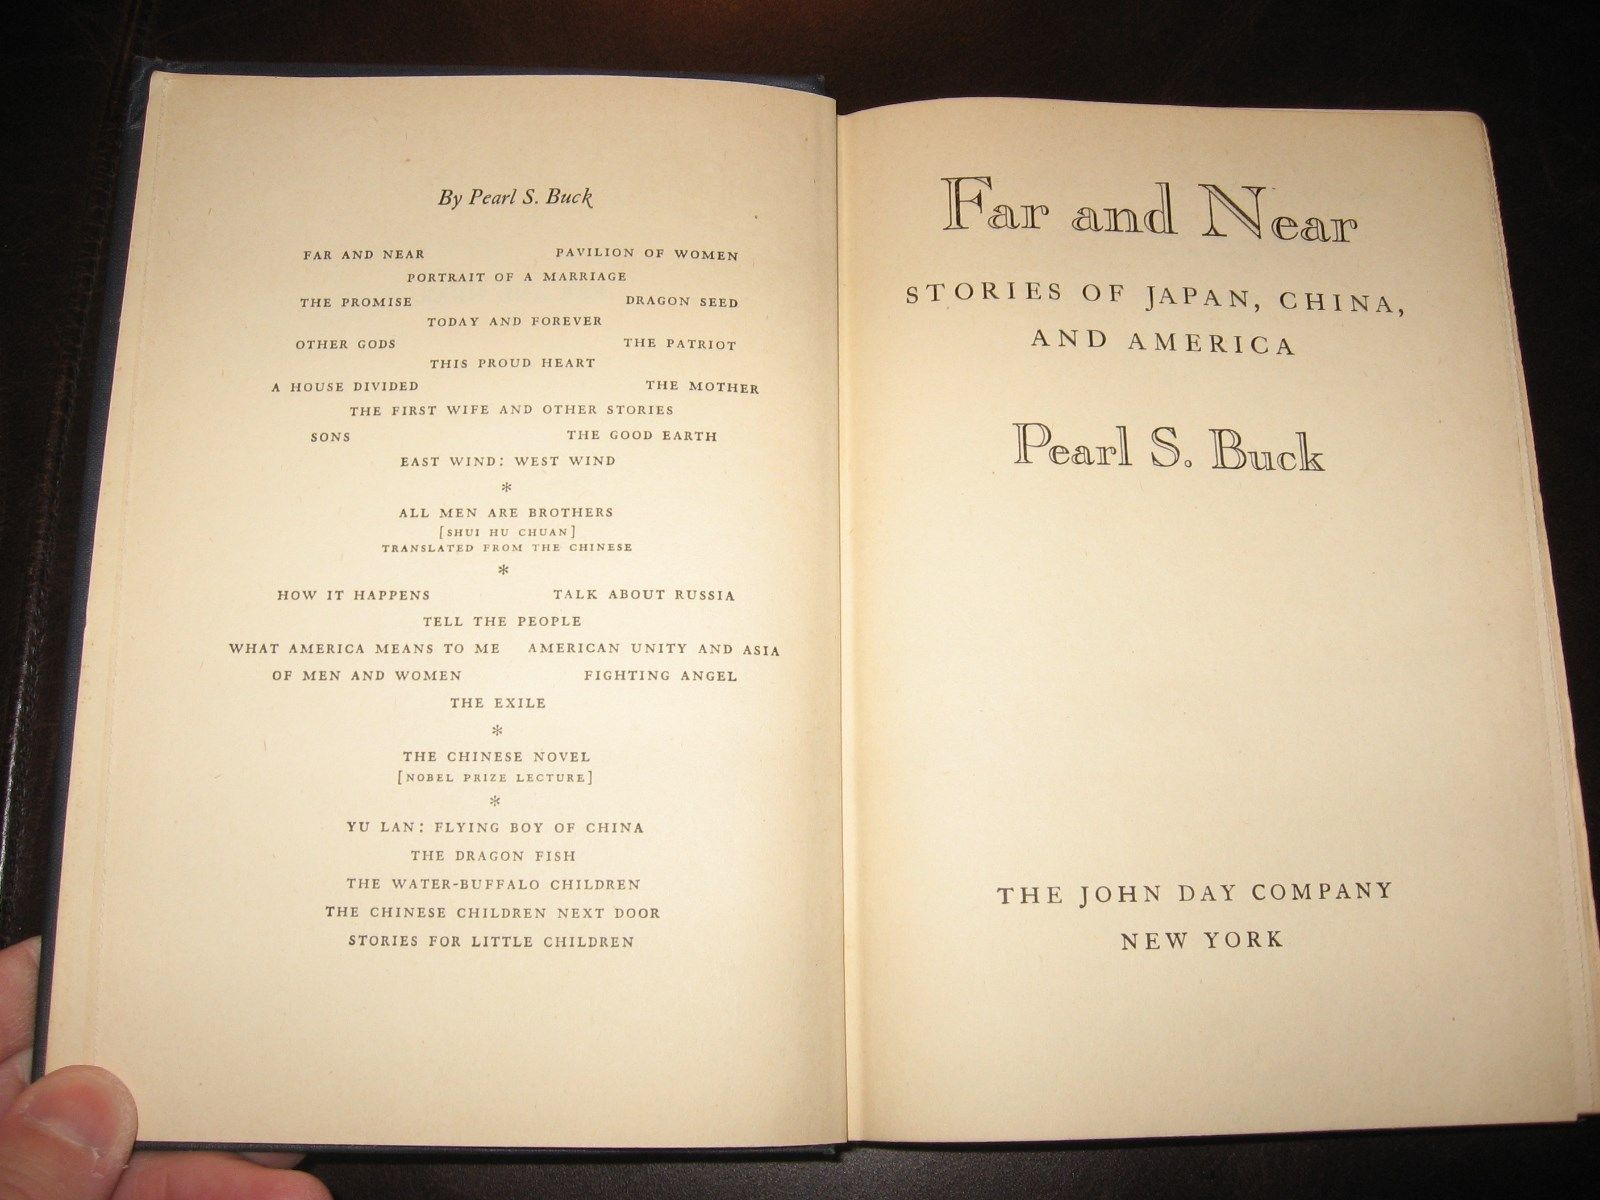 FAR AND NEAR * PEARL S. BUCK * 1947 HARDCOVER * VERY GOOD * JAPAN CHINA AMERICA image 4